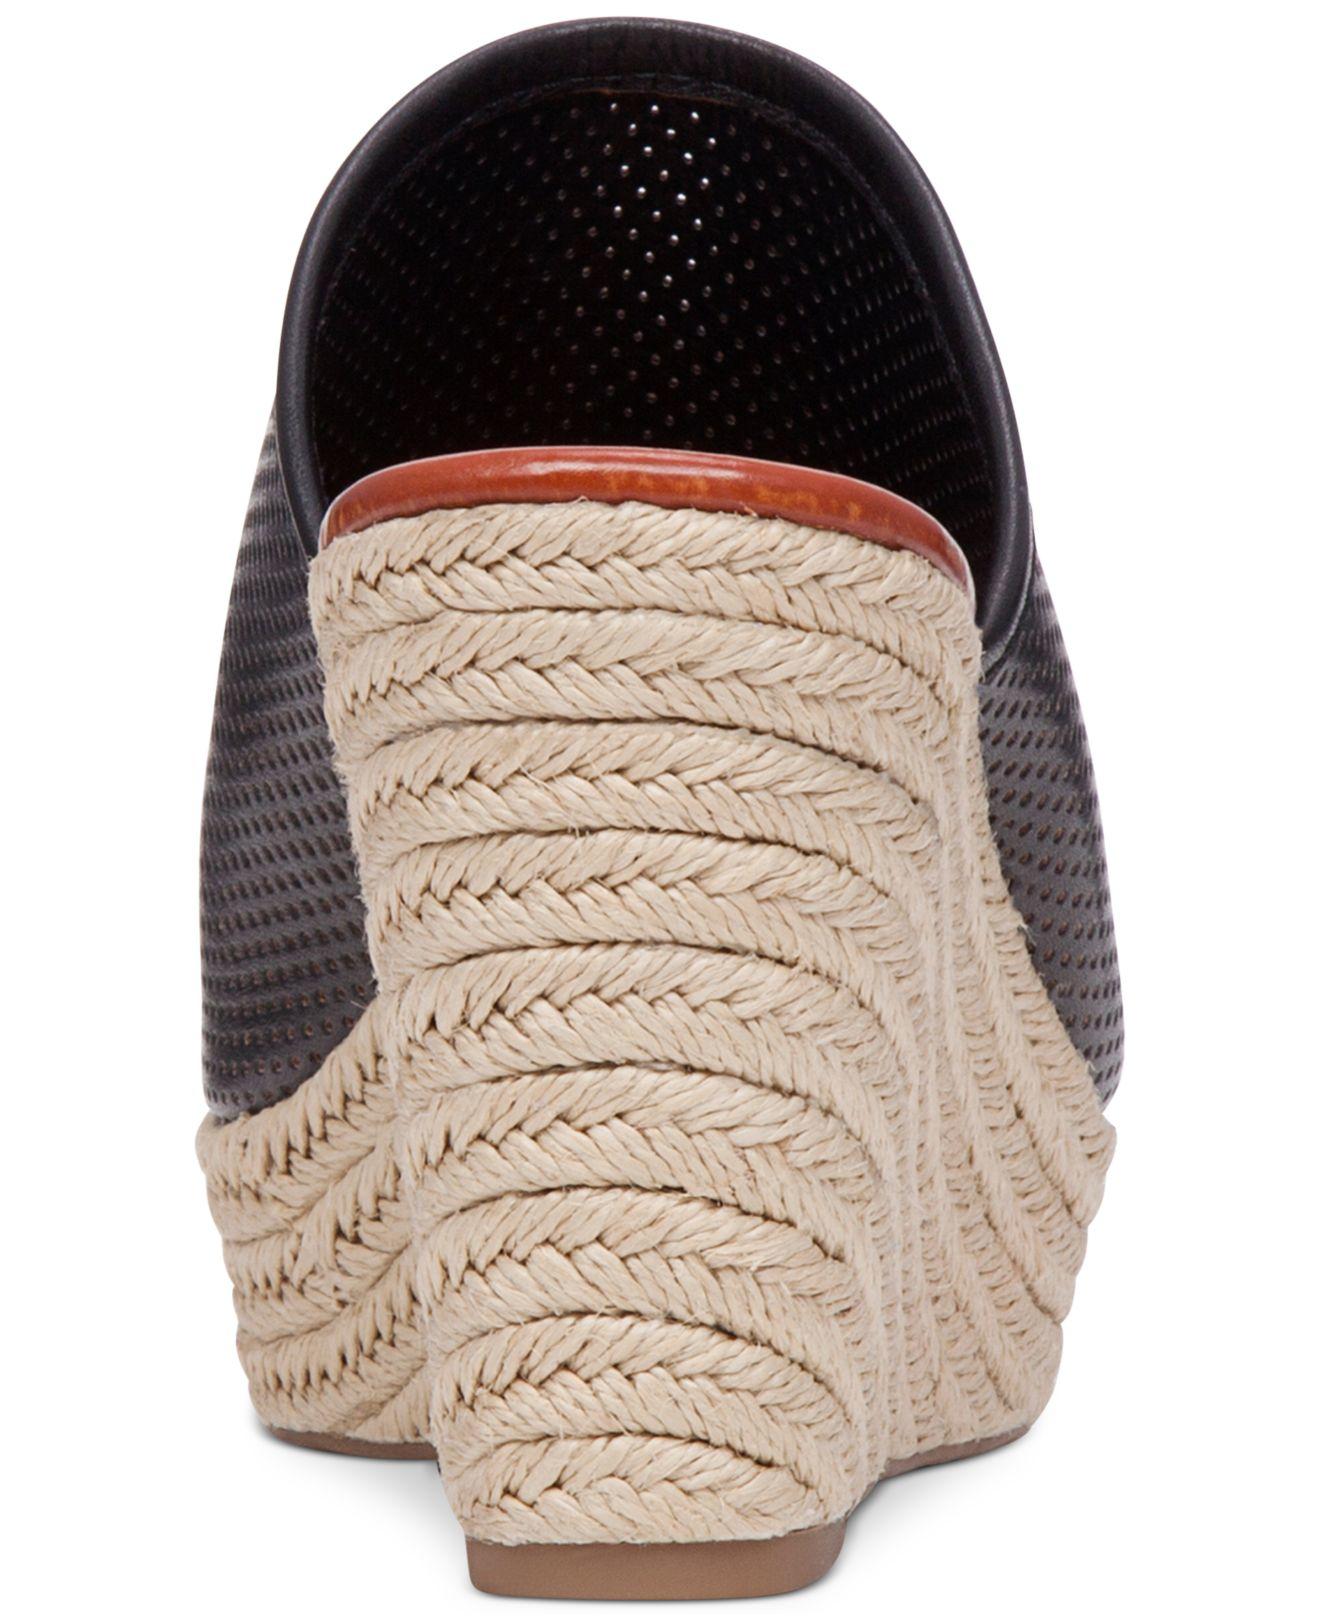 Lucky Brand Mackayla Rope Slide Sandals In Black Lyst